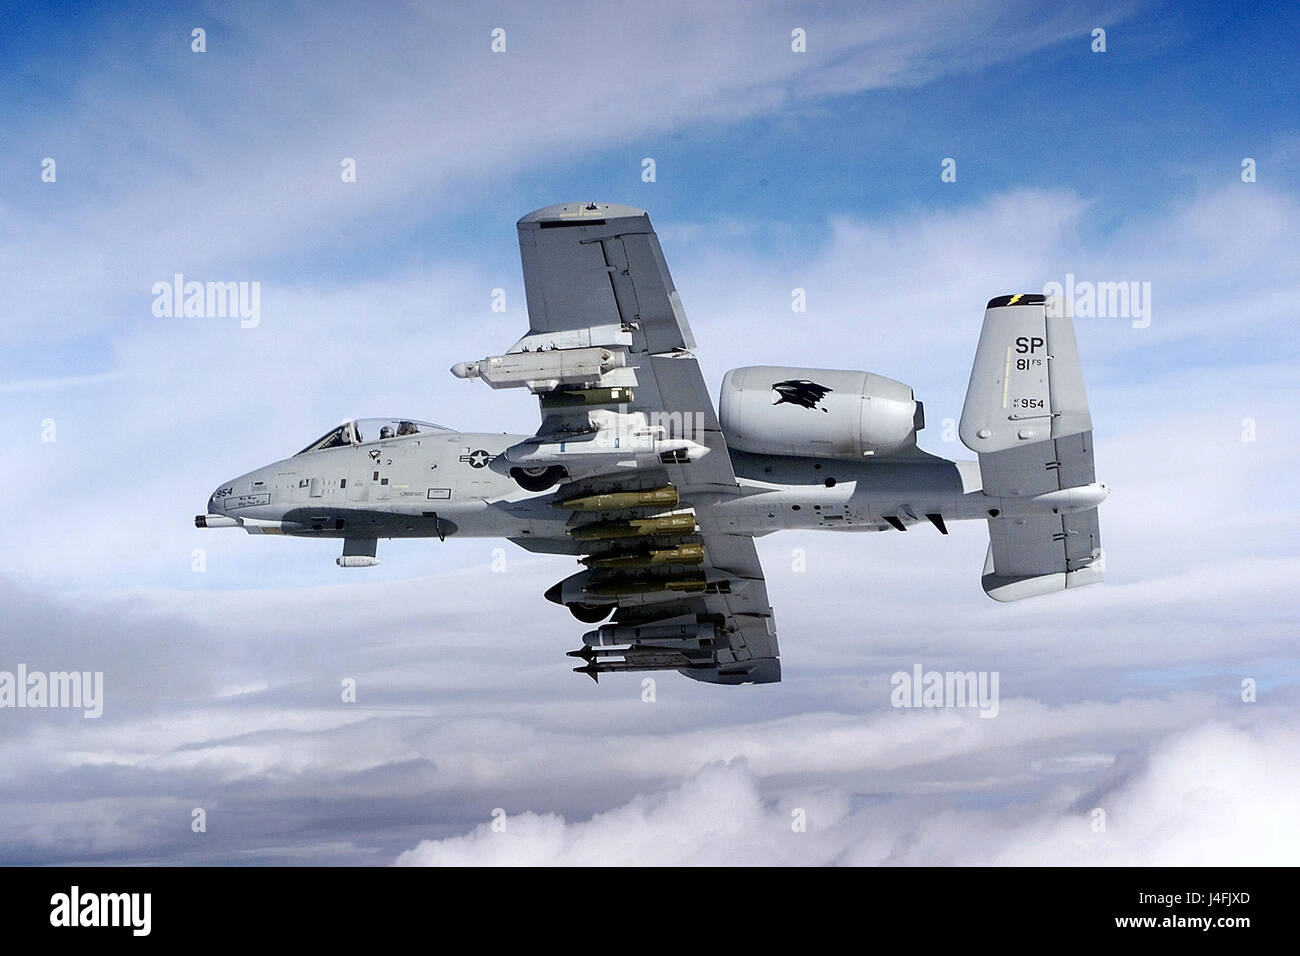 A-10 Thunderbolt II aircraft - Stock Image